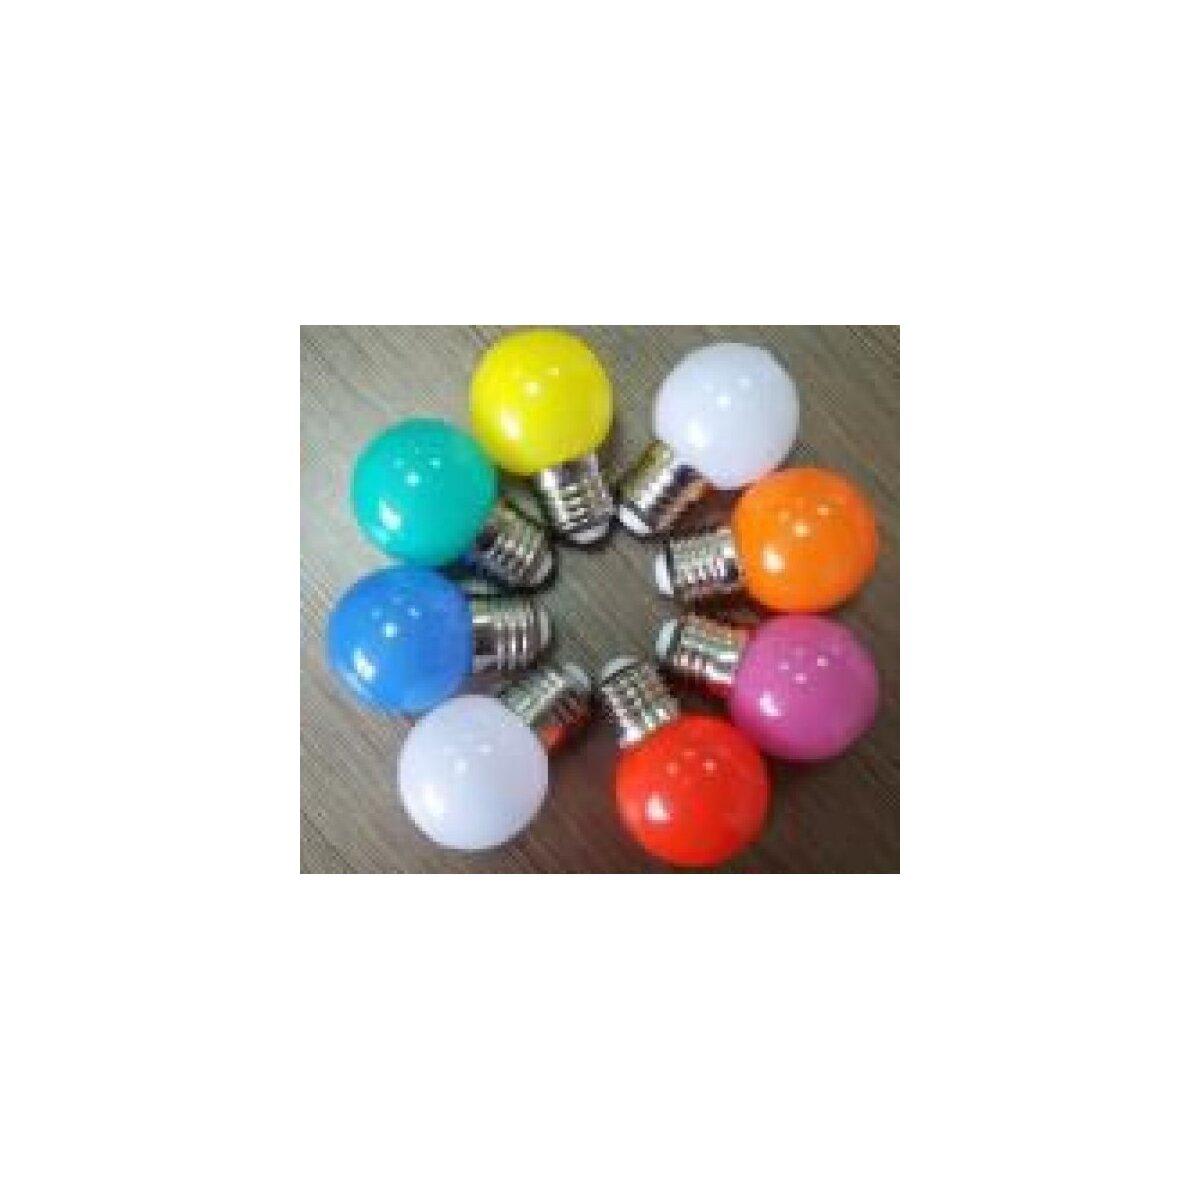 led retrofit e27 tropfenlampe g45 1 watt verschiedene farben ledx 1 49. Black Bedroom Furniture Sets. Home Design Ideas